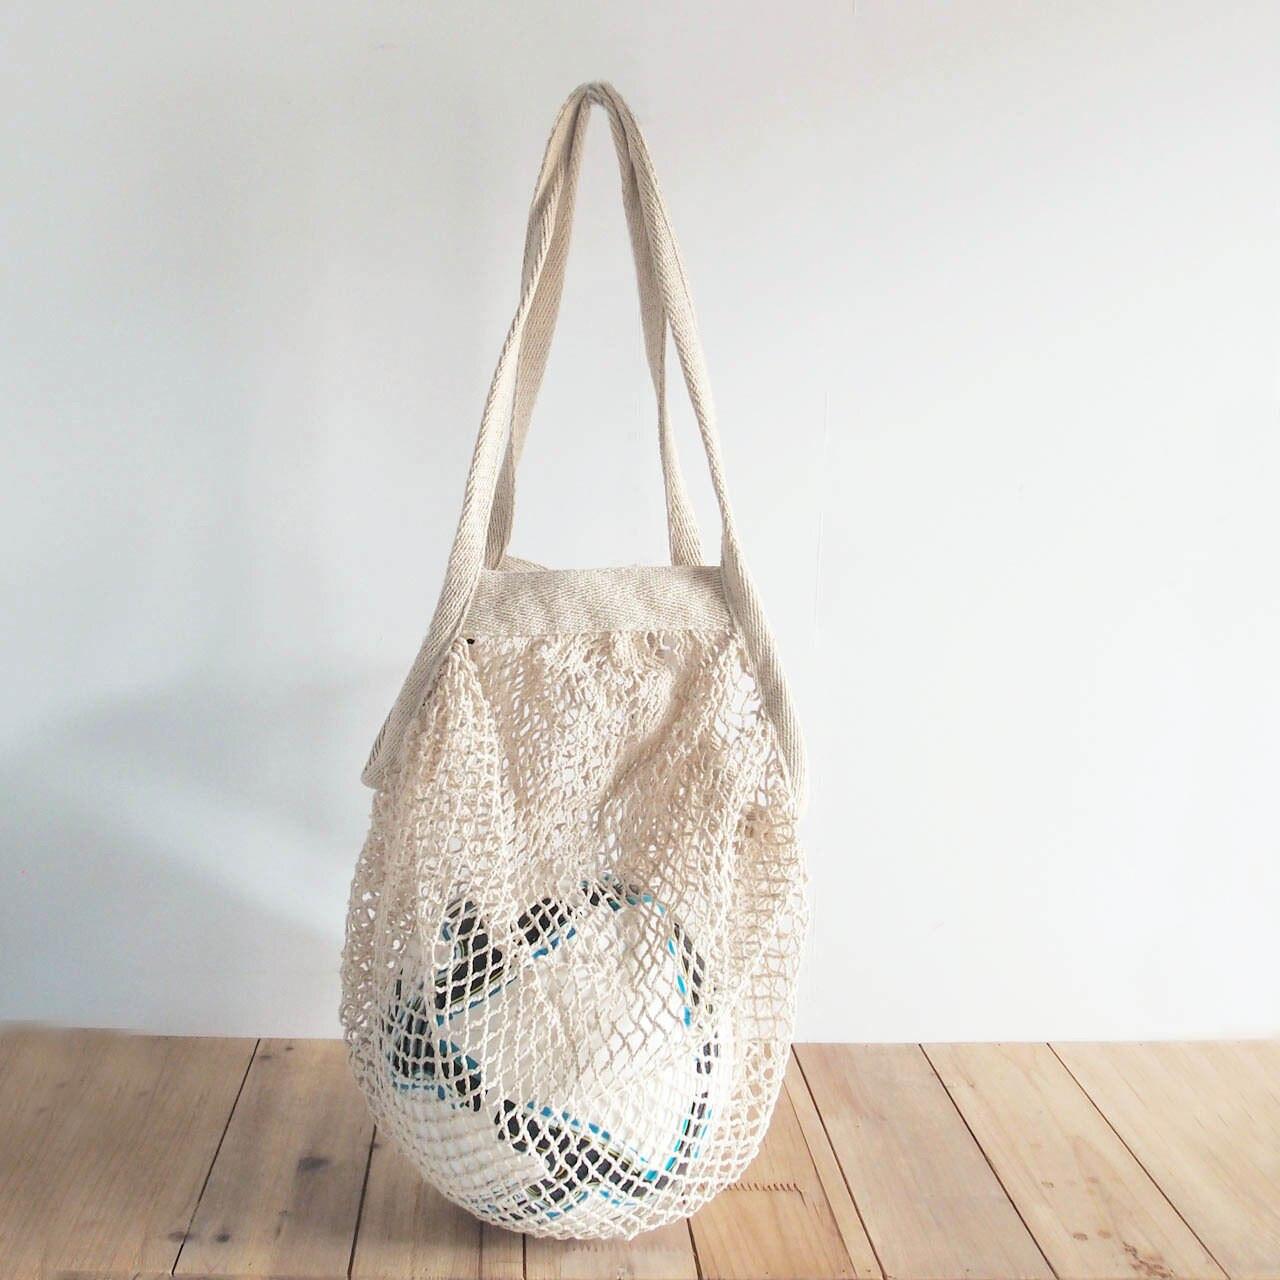 Cotton Mesh Tote Bags, Organic Cotton Market Tote Bags, Reusable Cotton Mesh Bags  | Packaging Decor